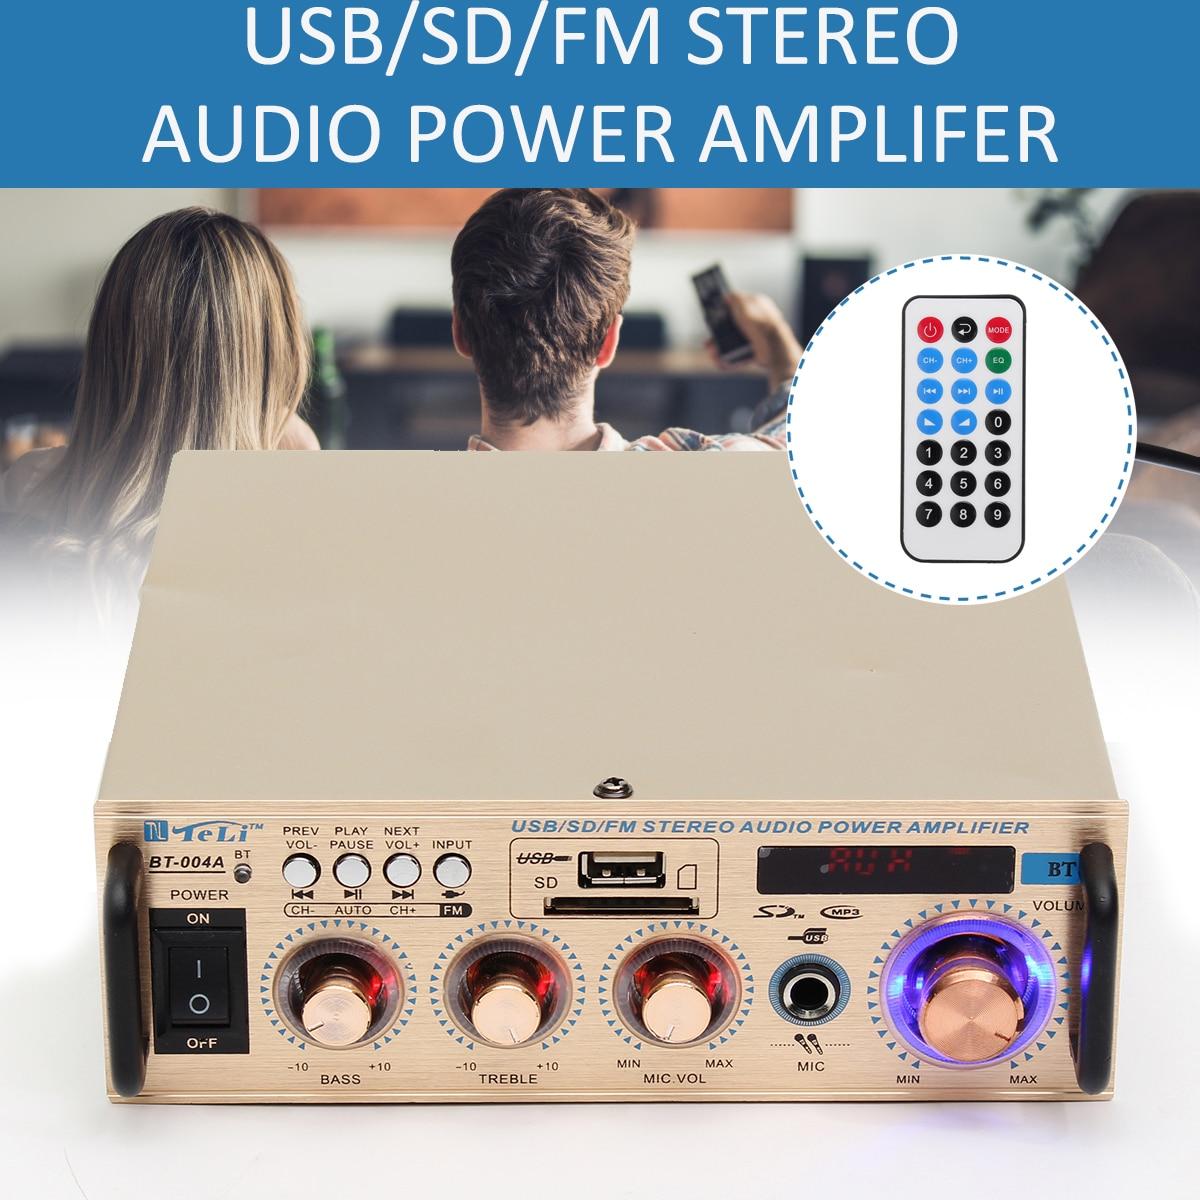 100W Car Amplifiers Audio Wireless Bluetooth 12V/ 220V Stereo Power Amplifier Home Theater Amplifiers Audio Music Player 300w 300w 2 channel hifi audio stereo power amplifier bluetooth fm radio car home theater amplifiers music player